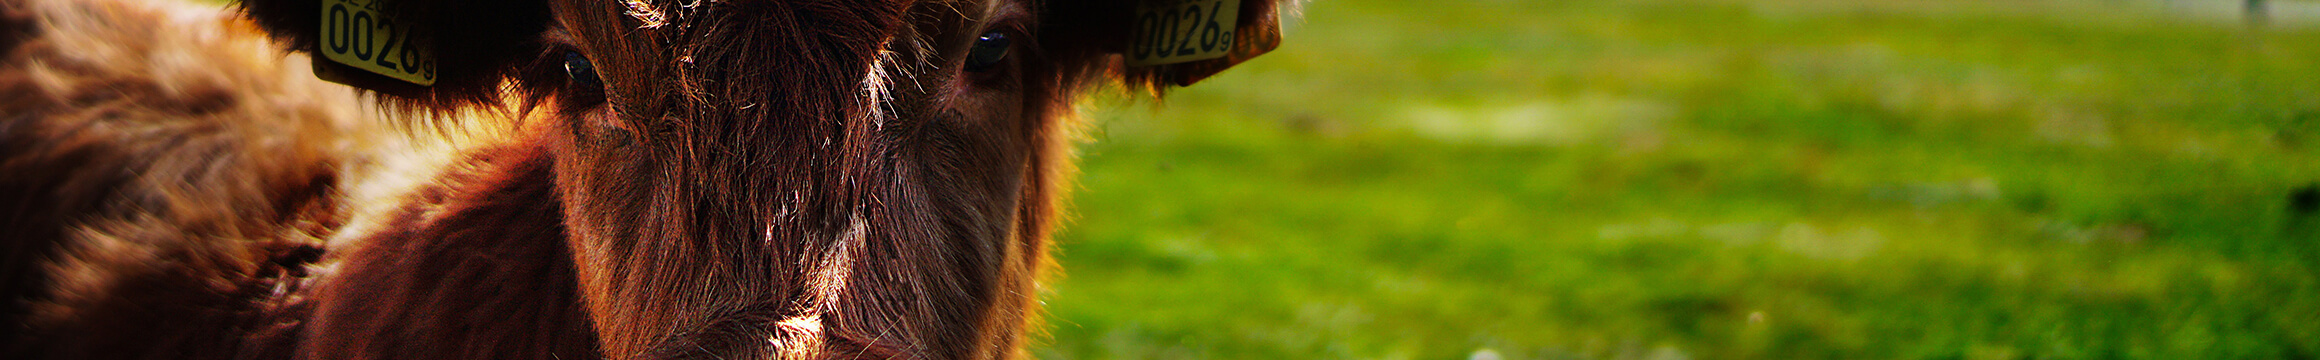 Farm Animals 02